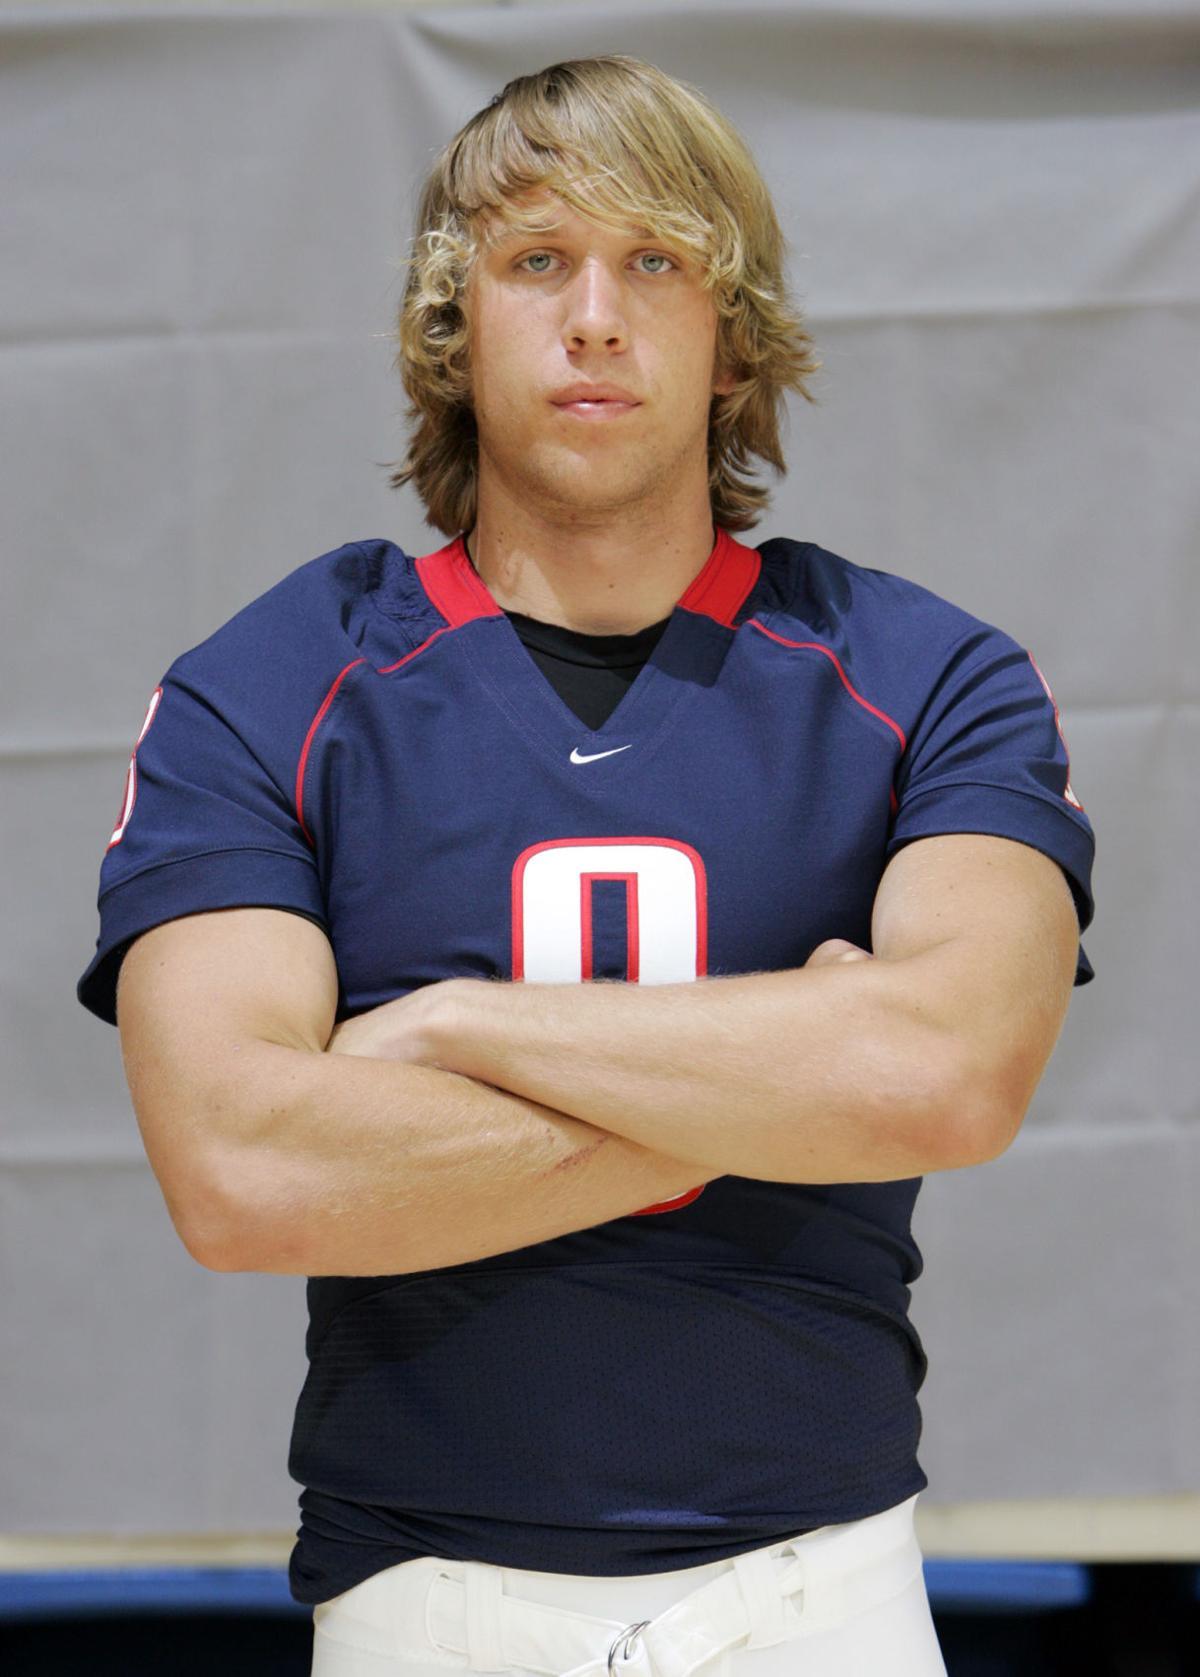 huge discount b1852 51e69 Photos: Arizona Wildcats quarterback Nick Foles, 2009-11 ...